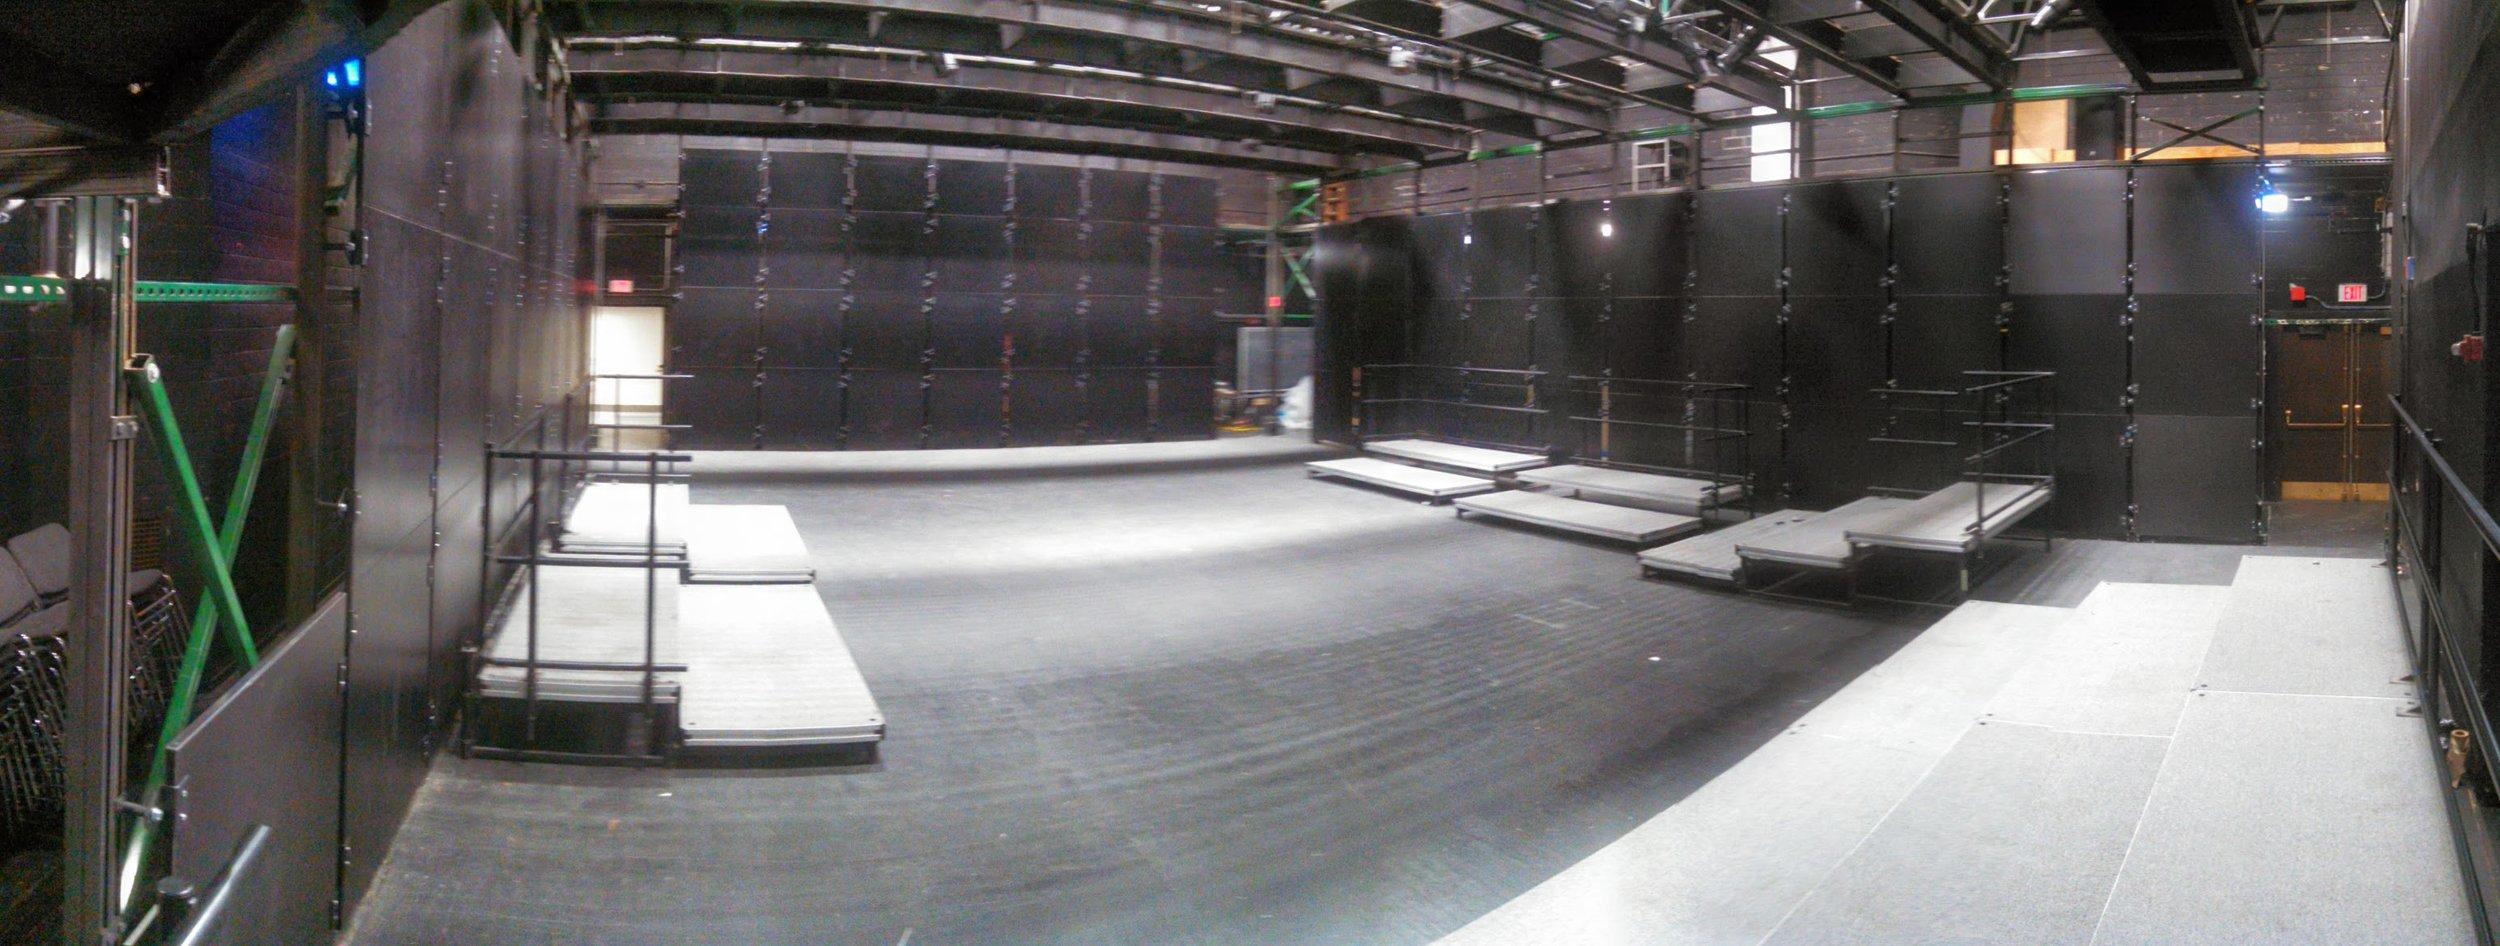 New Studio Theatre walls installed.